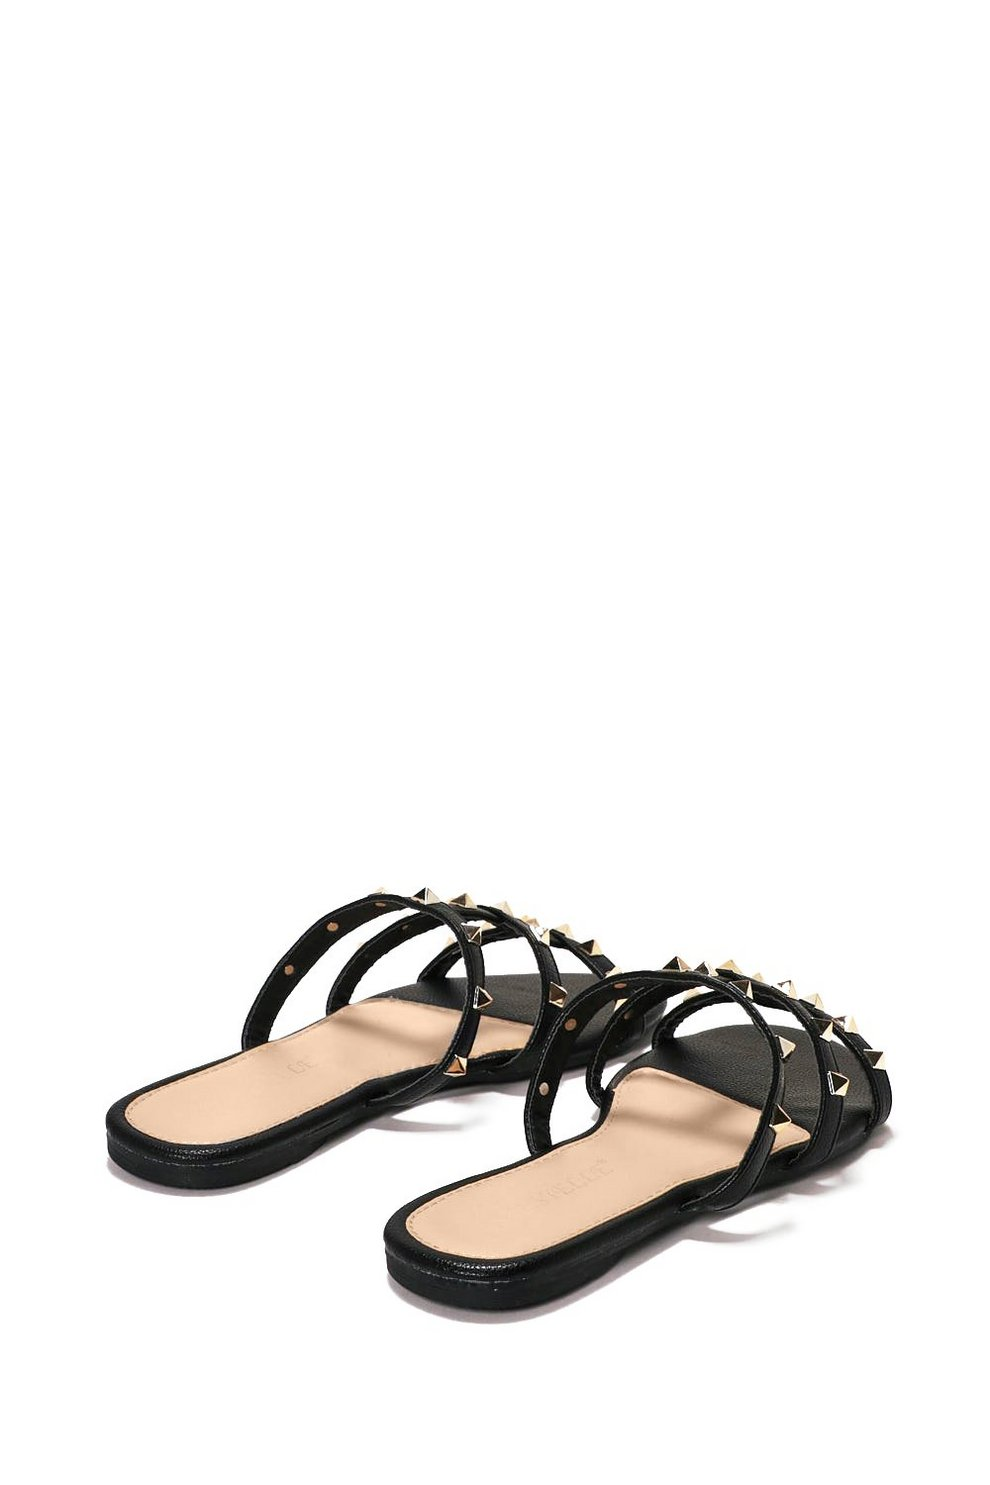 6e01089cc2 Get Spiked Slide Sandal   Shop Clothes at Nasty Gal!